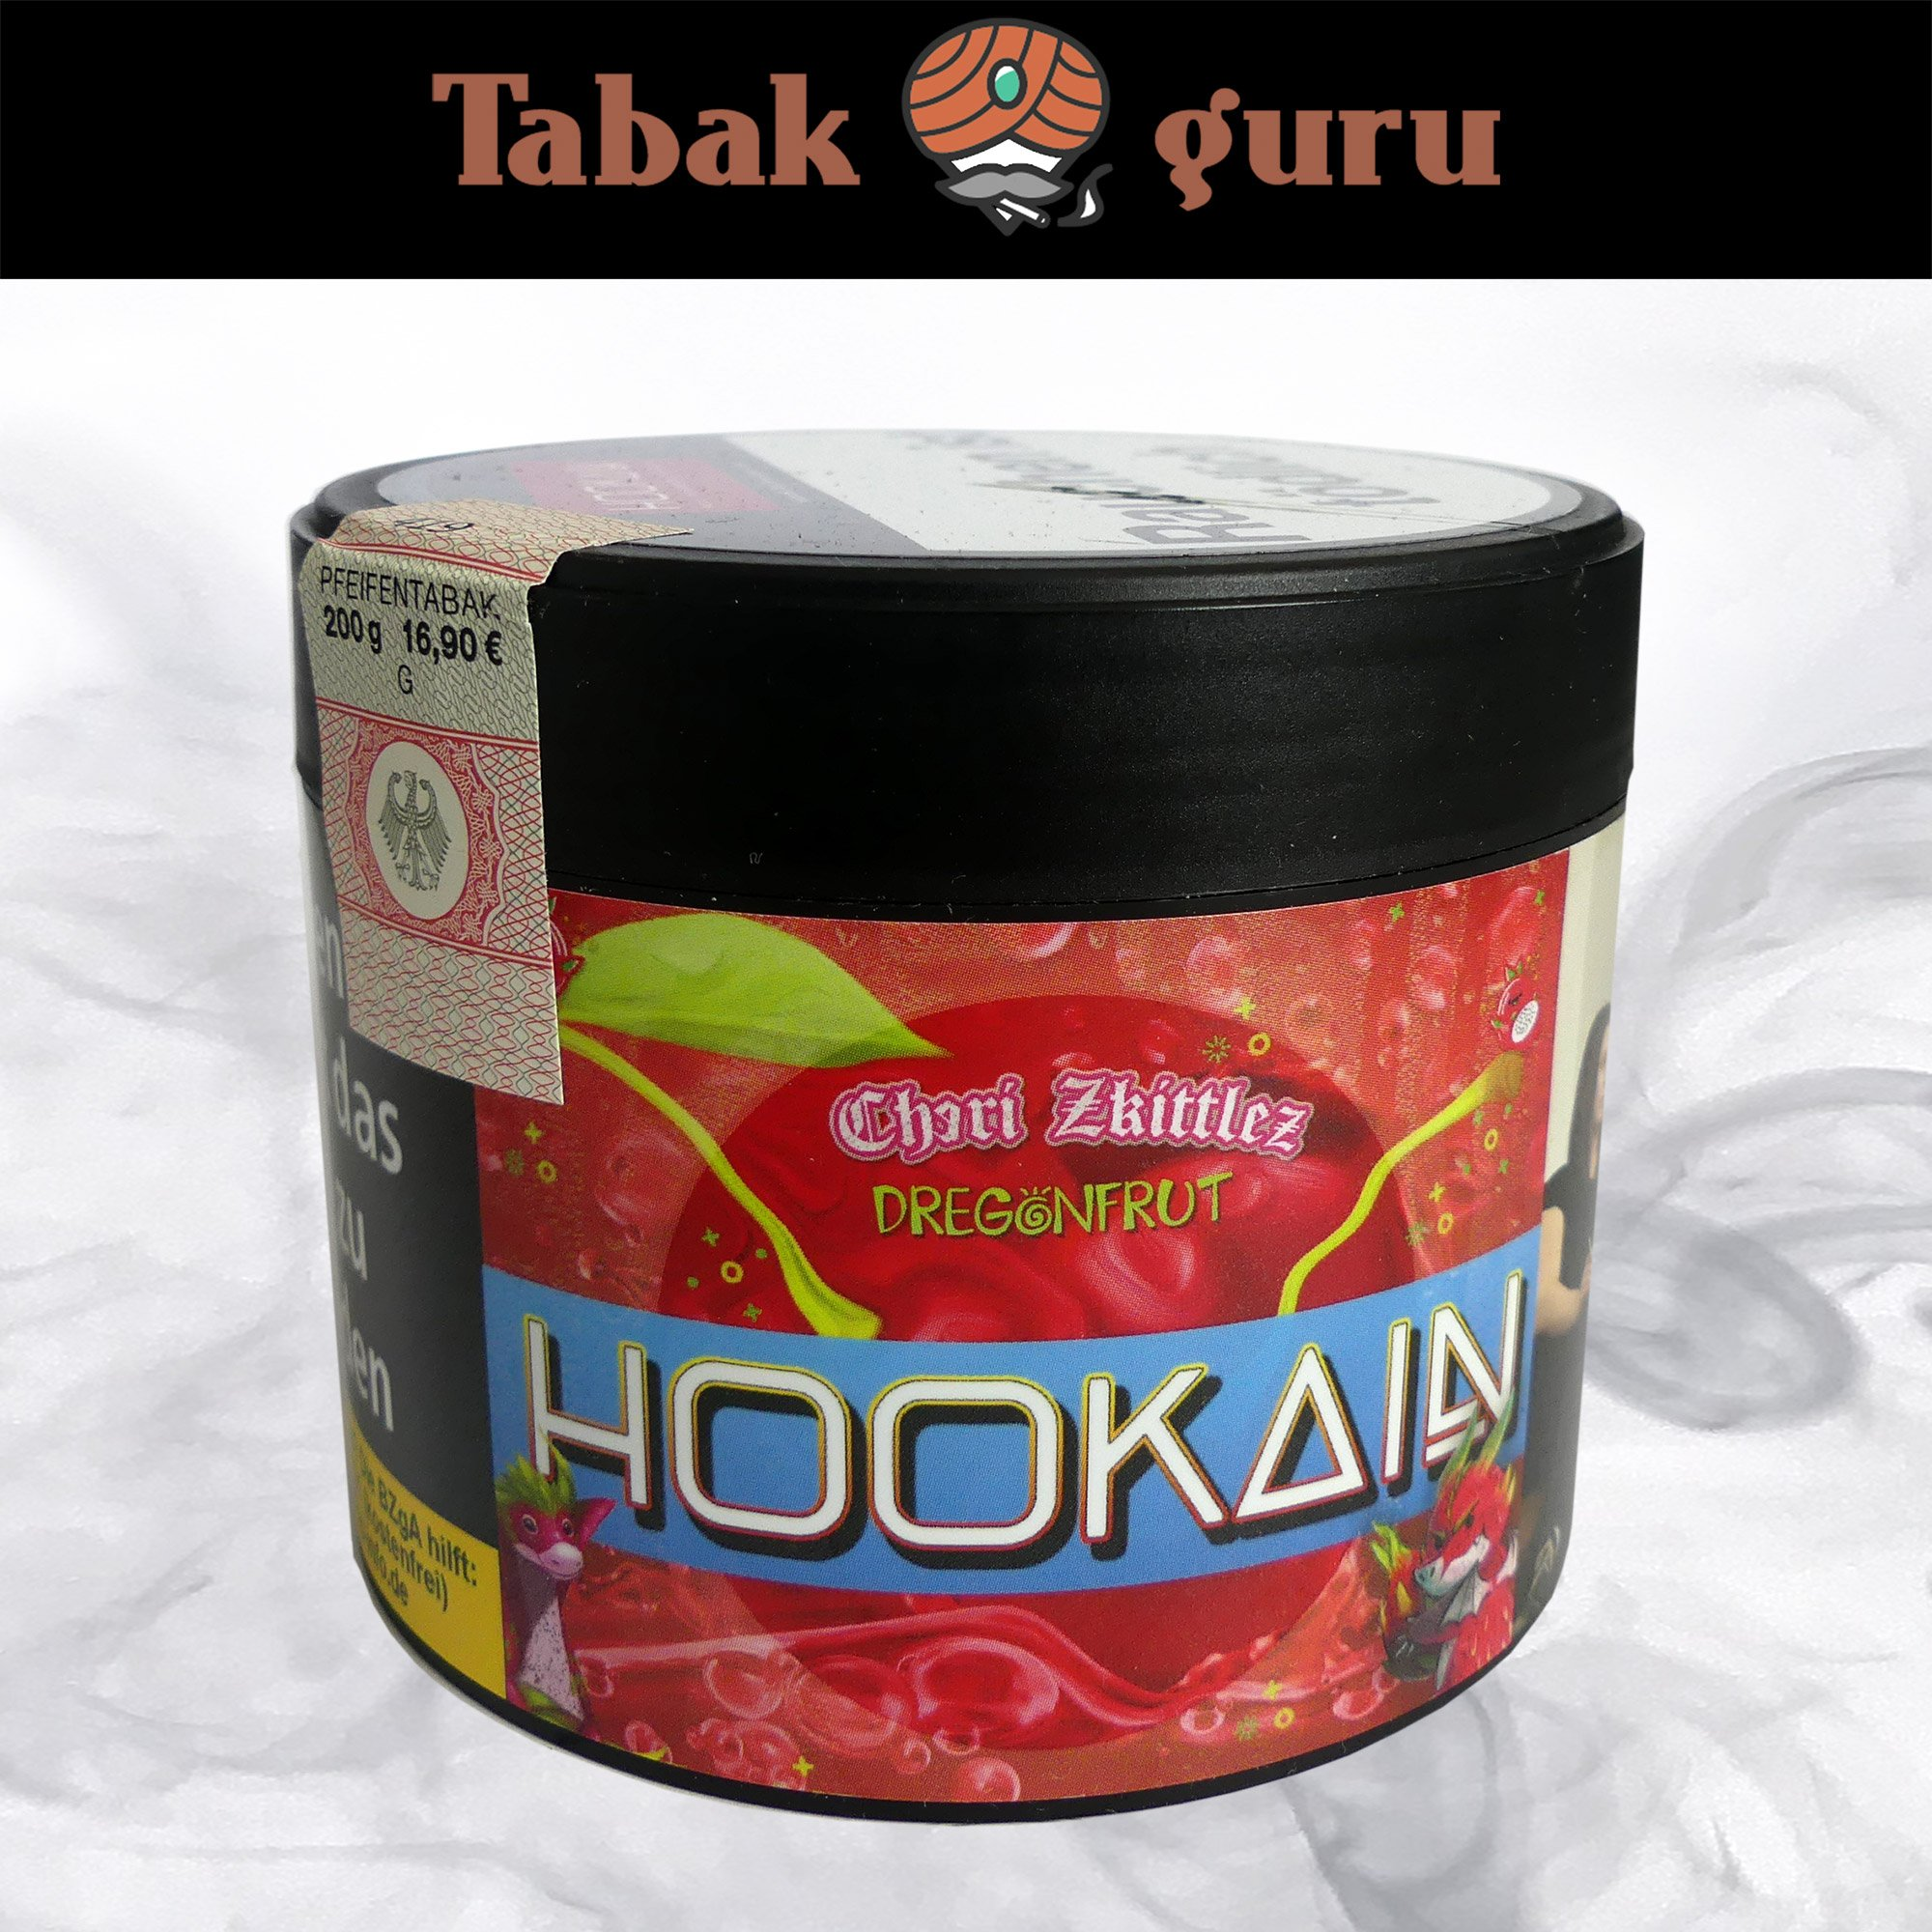 Hookain Cheri Zkittlez & Dregonfrut 200g - Shisha Tabak